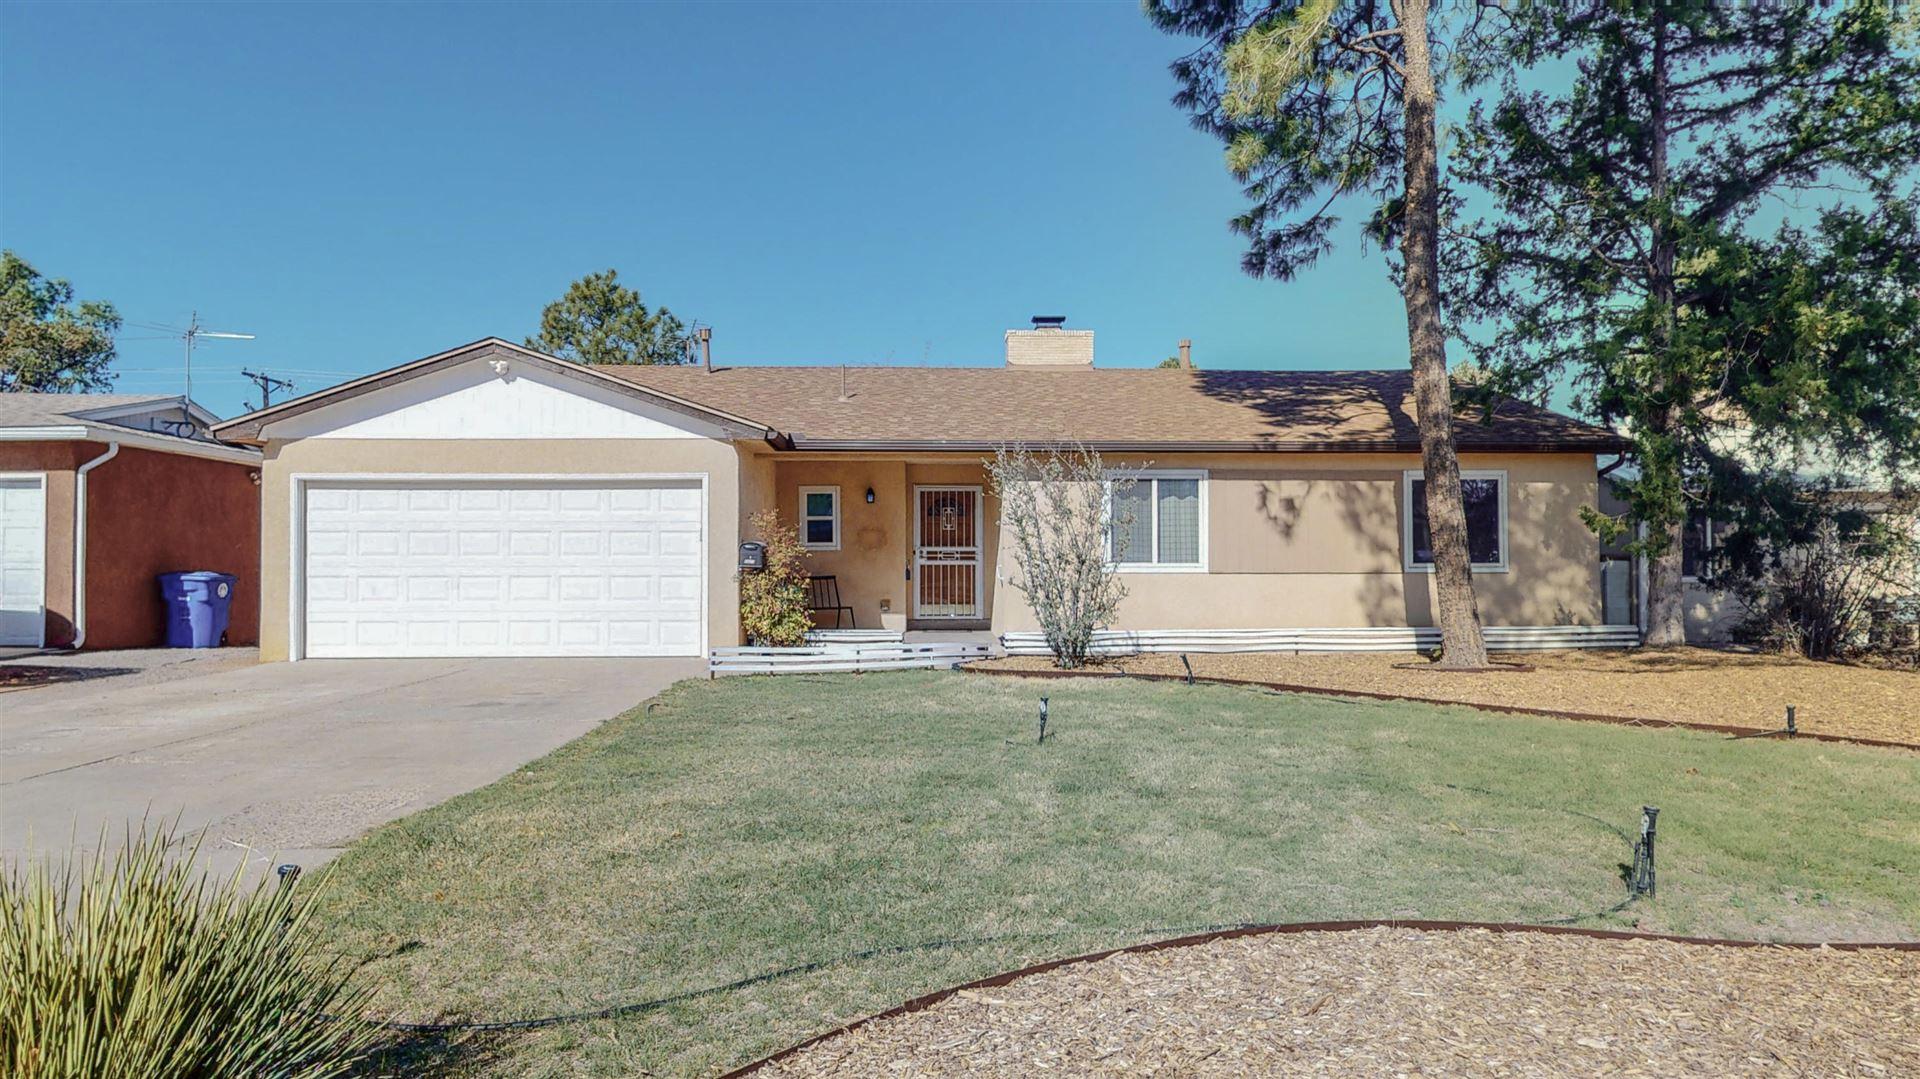 1417 Dartmouth Drive NE, Albuquerque, NM 87106 - MLS#: 989379